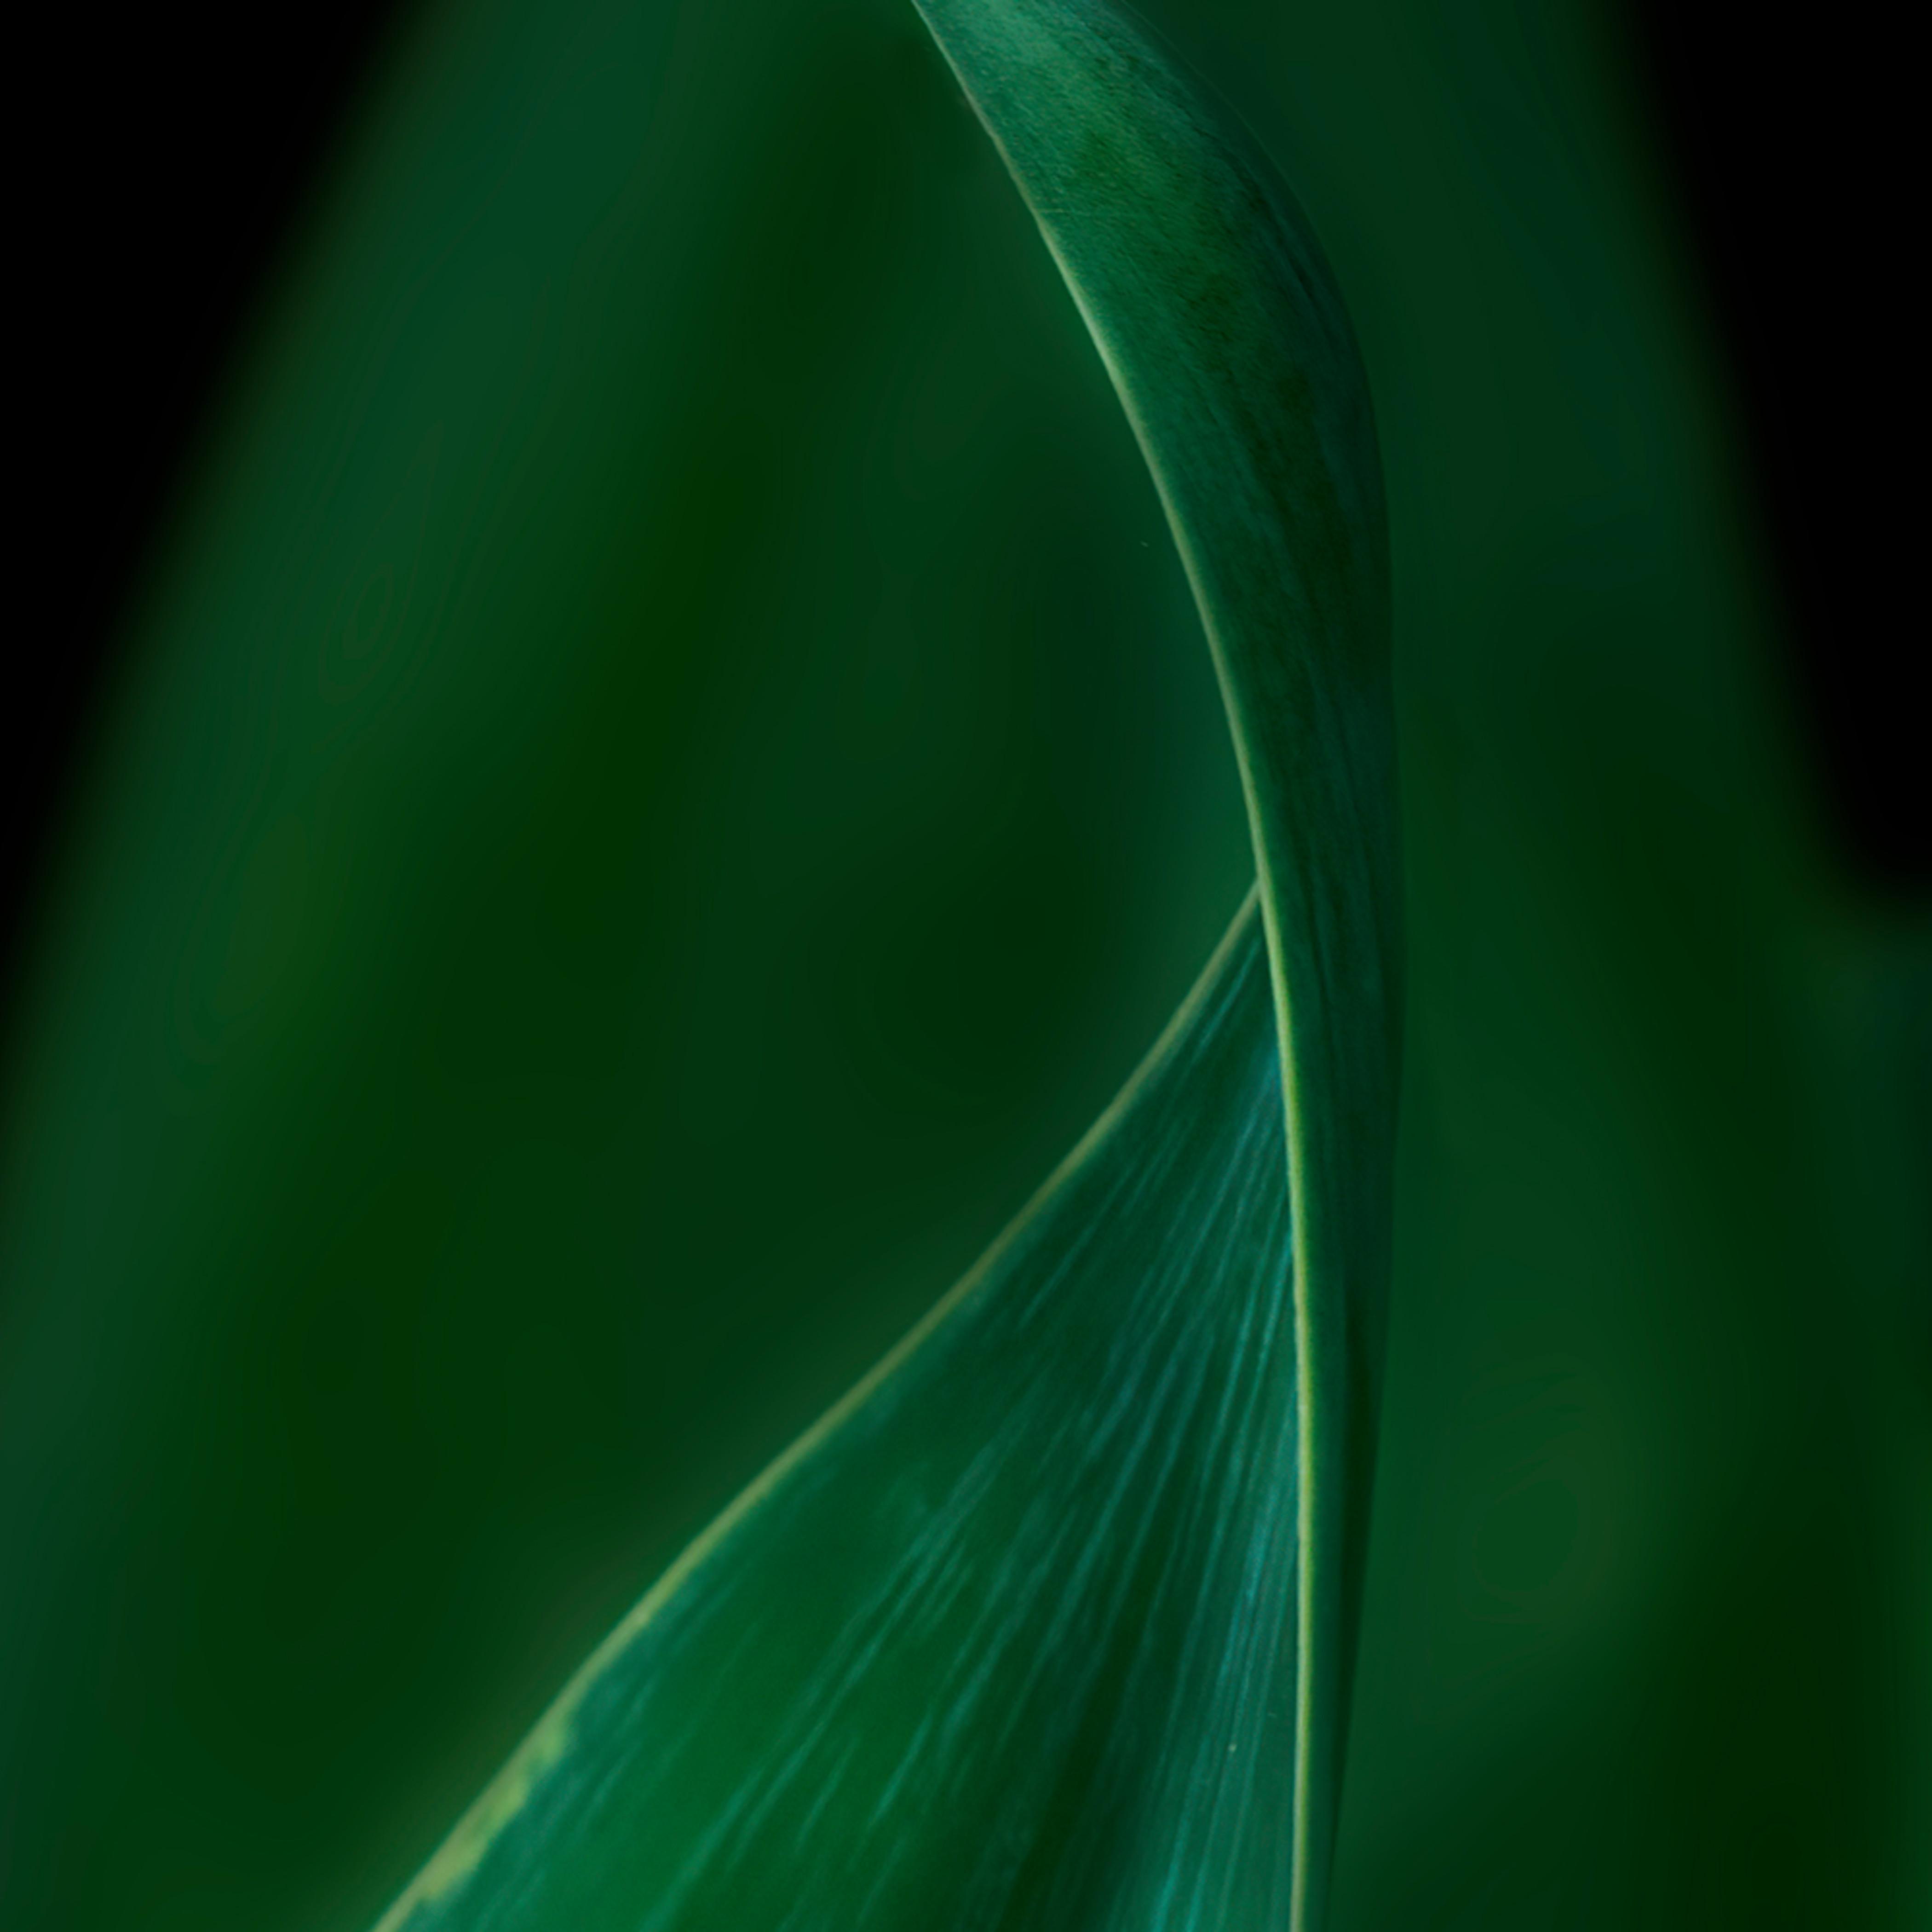 Green curving tzkzdc